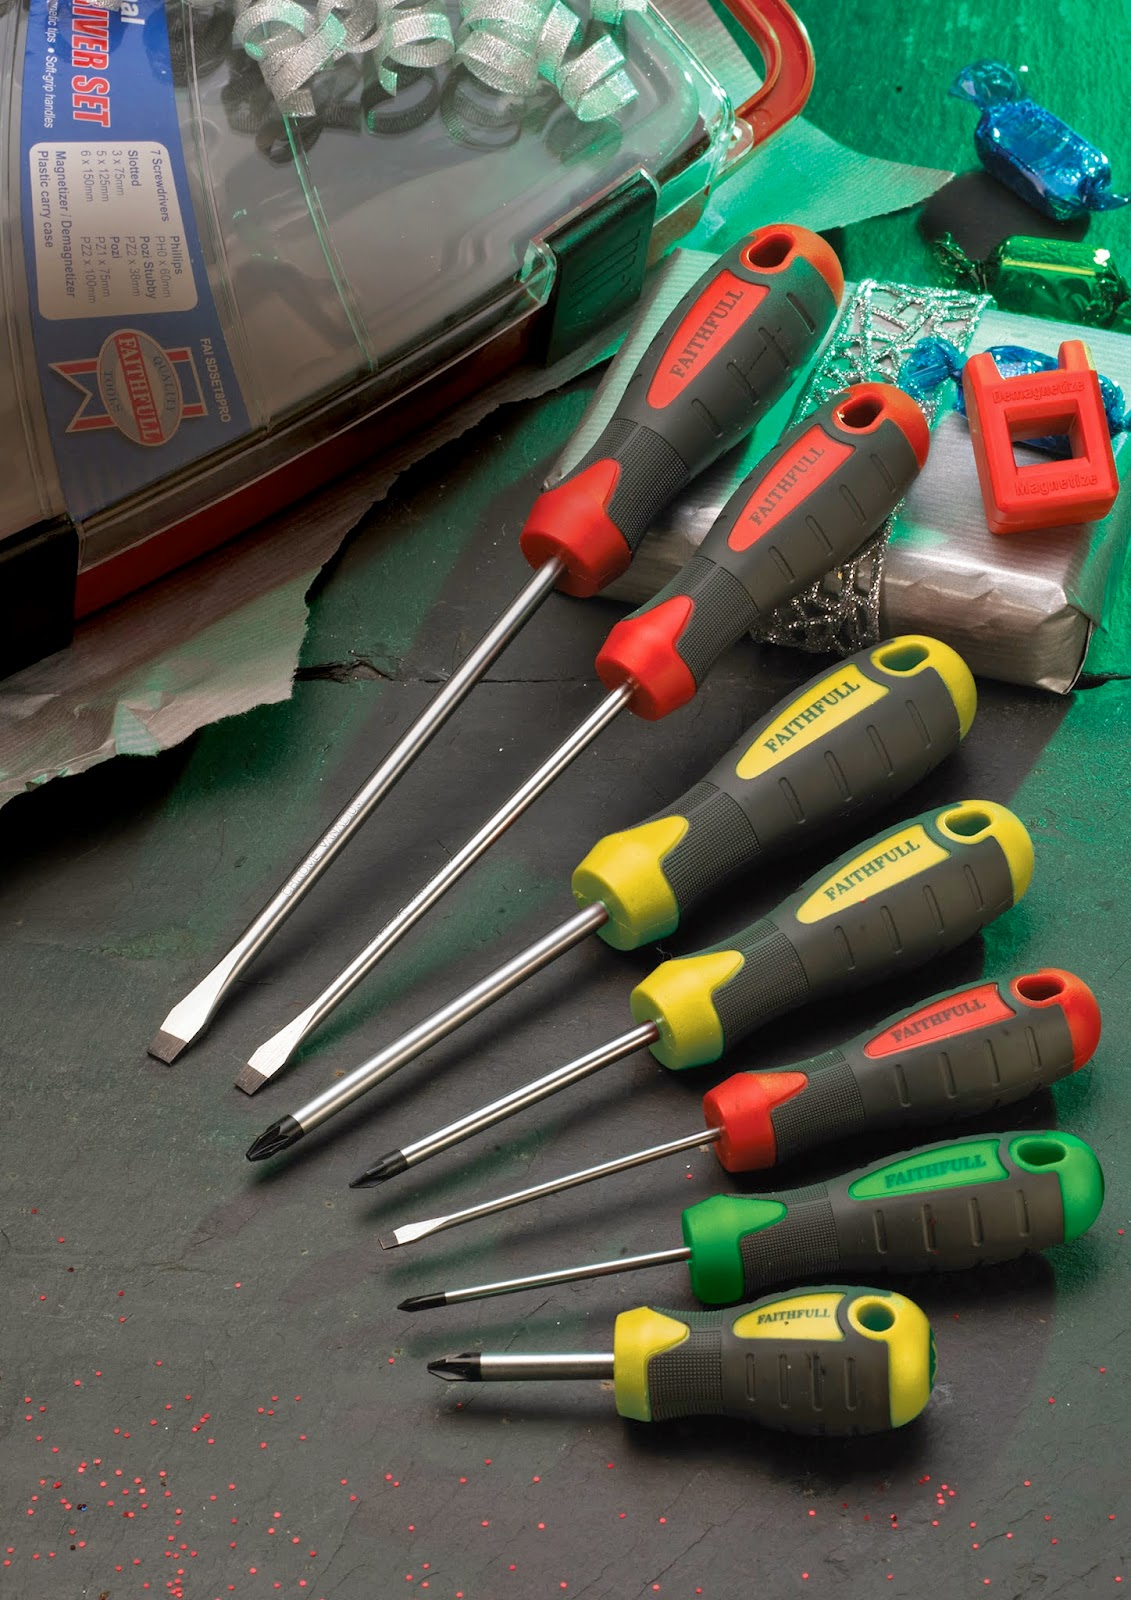 http://www.beesleyandfildes.co.uk/faithfull-7-piece-screwdriver-set-and-magnetiser-ref-xms14screw/